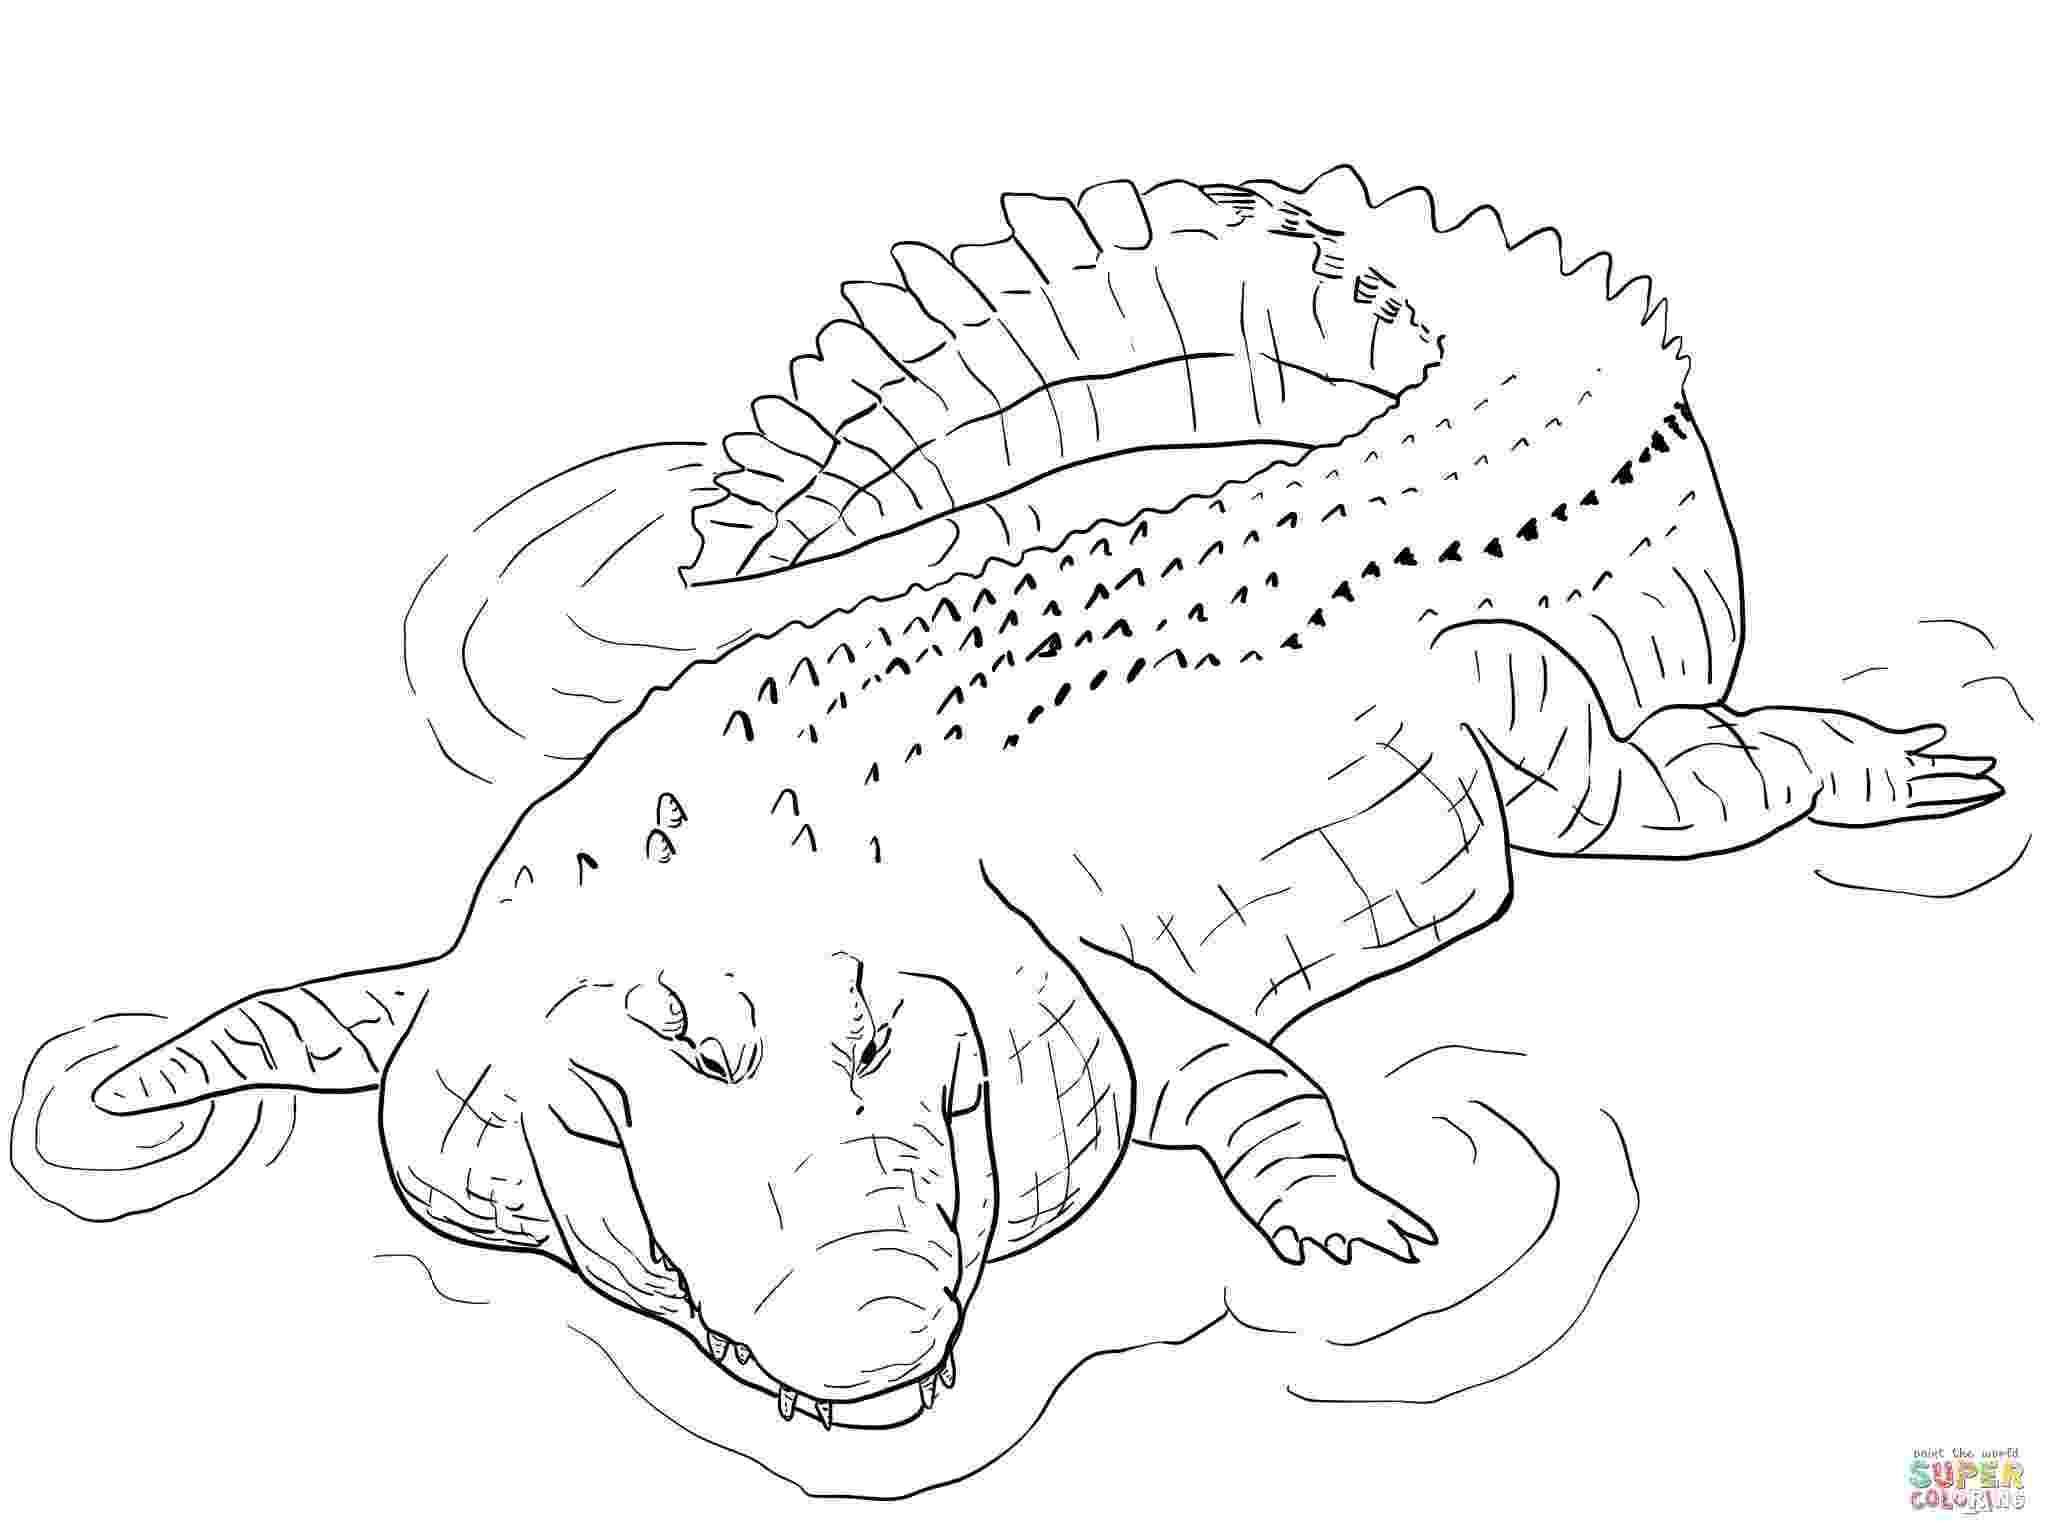 crocodile coloring alligators and crocodiles coloring pages download and crocodile coloring